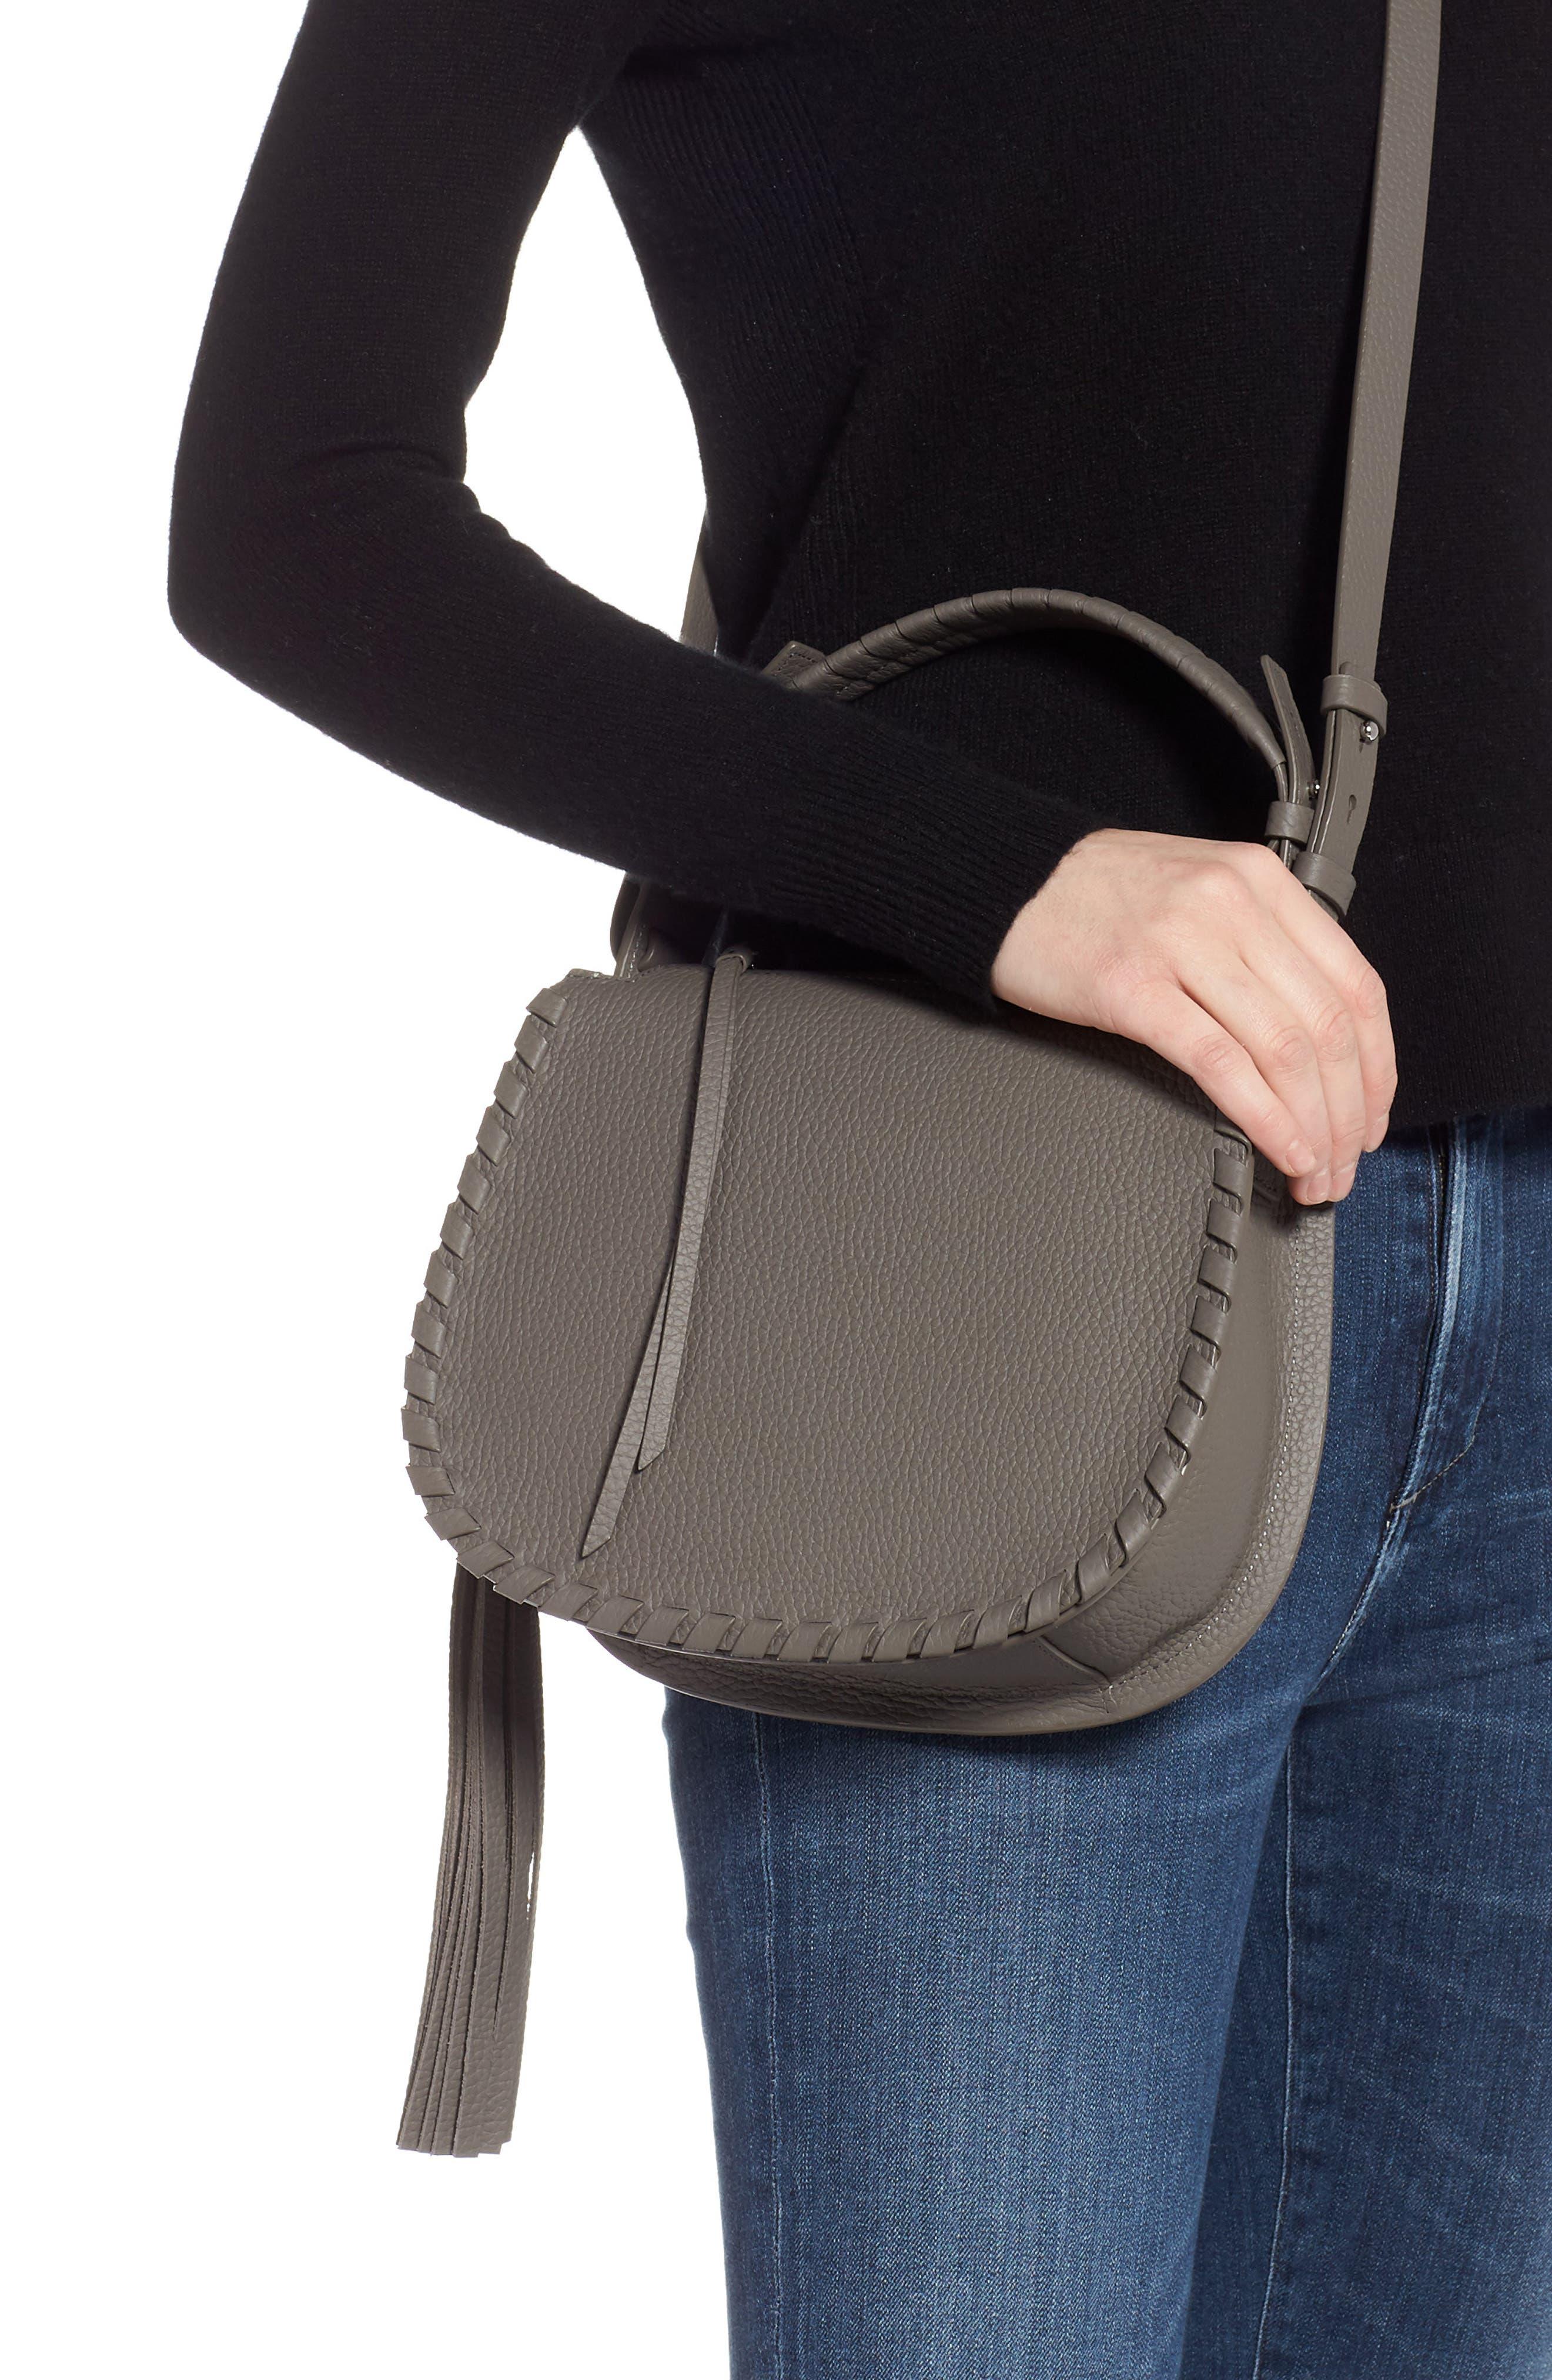 ALLSAINTS, Mori Leather Crossbody Bag, Alternate thumbnail 2, color, STORM GREY